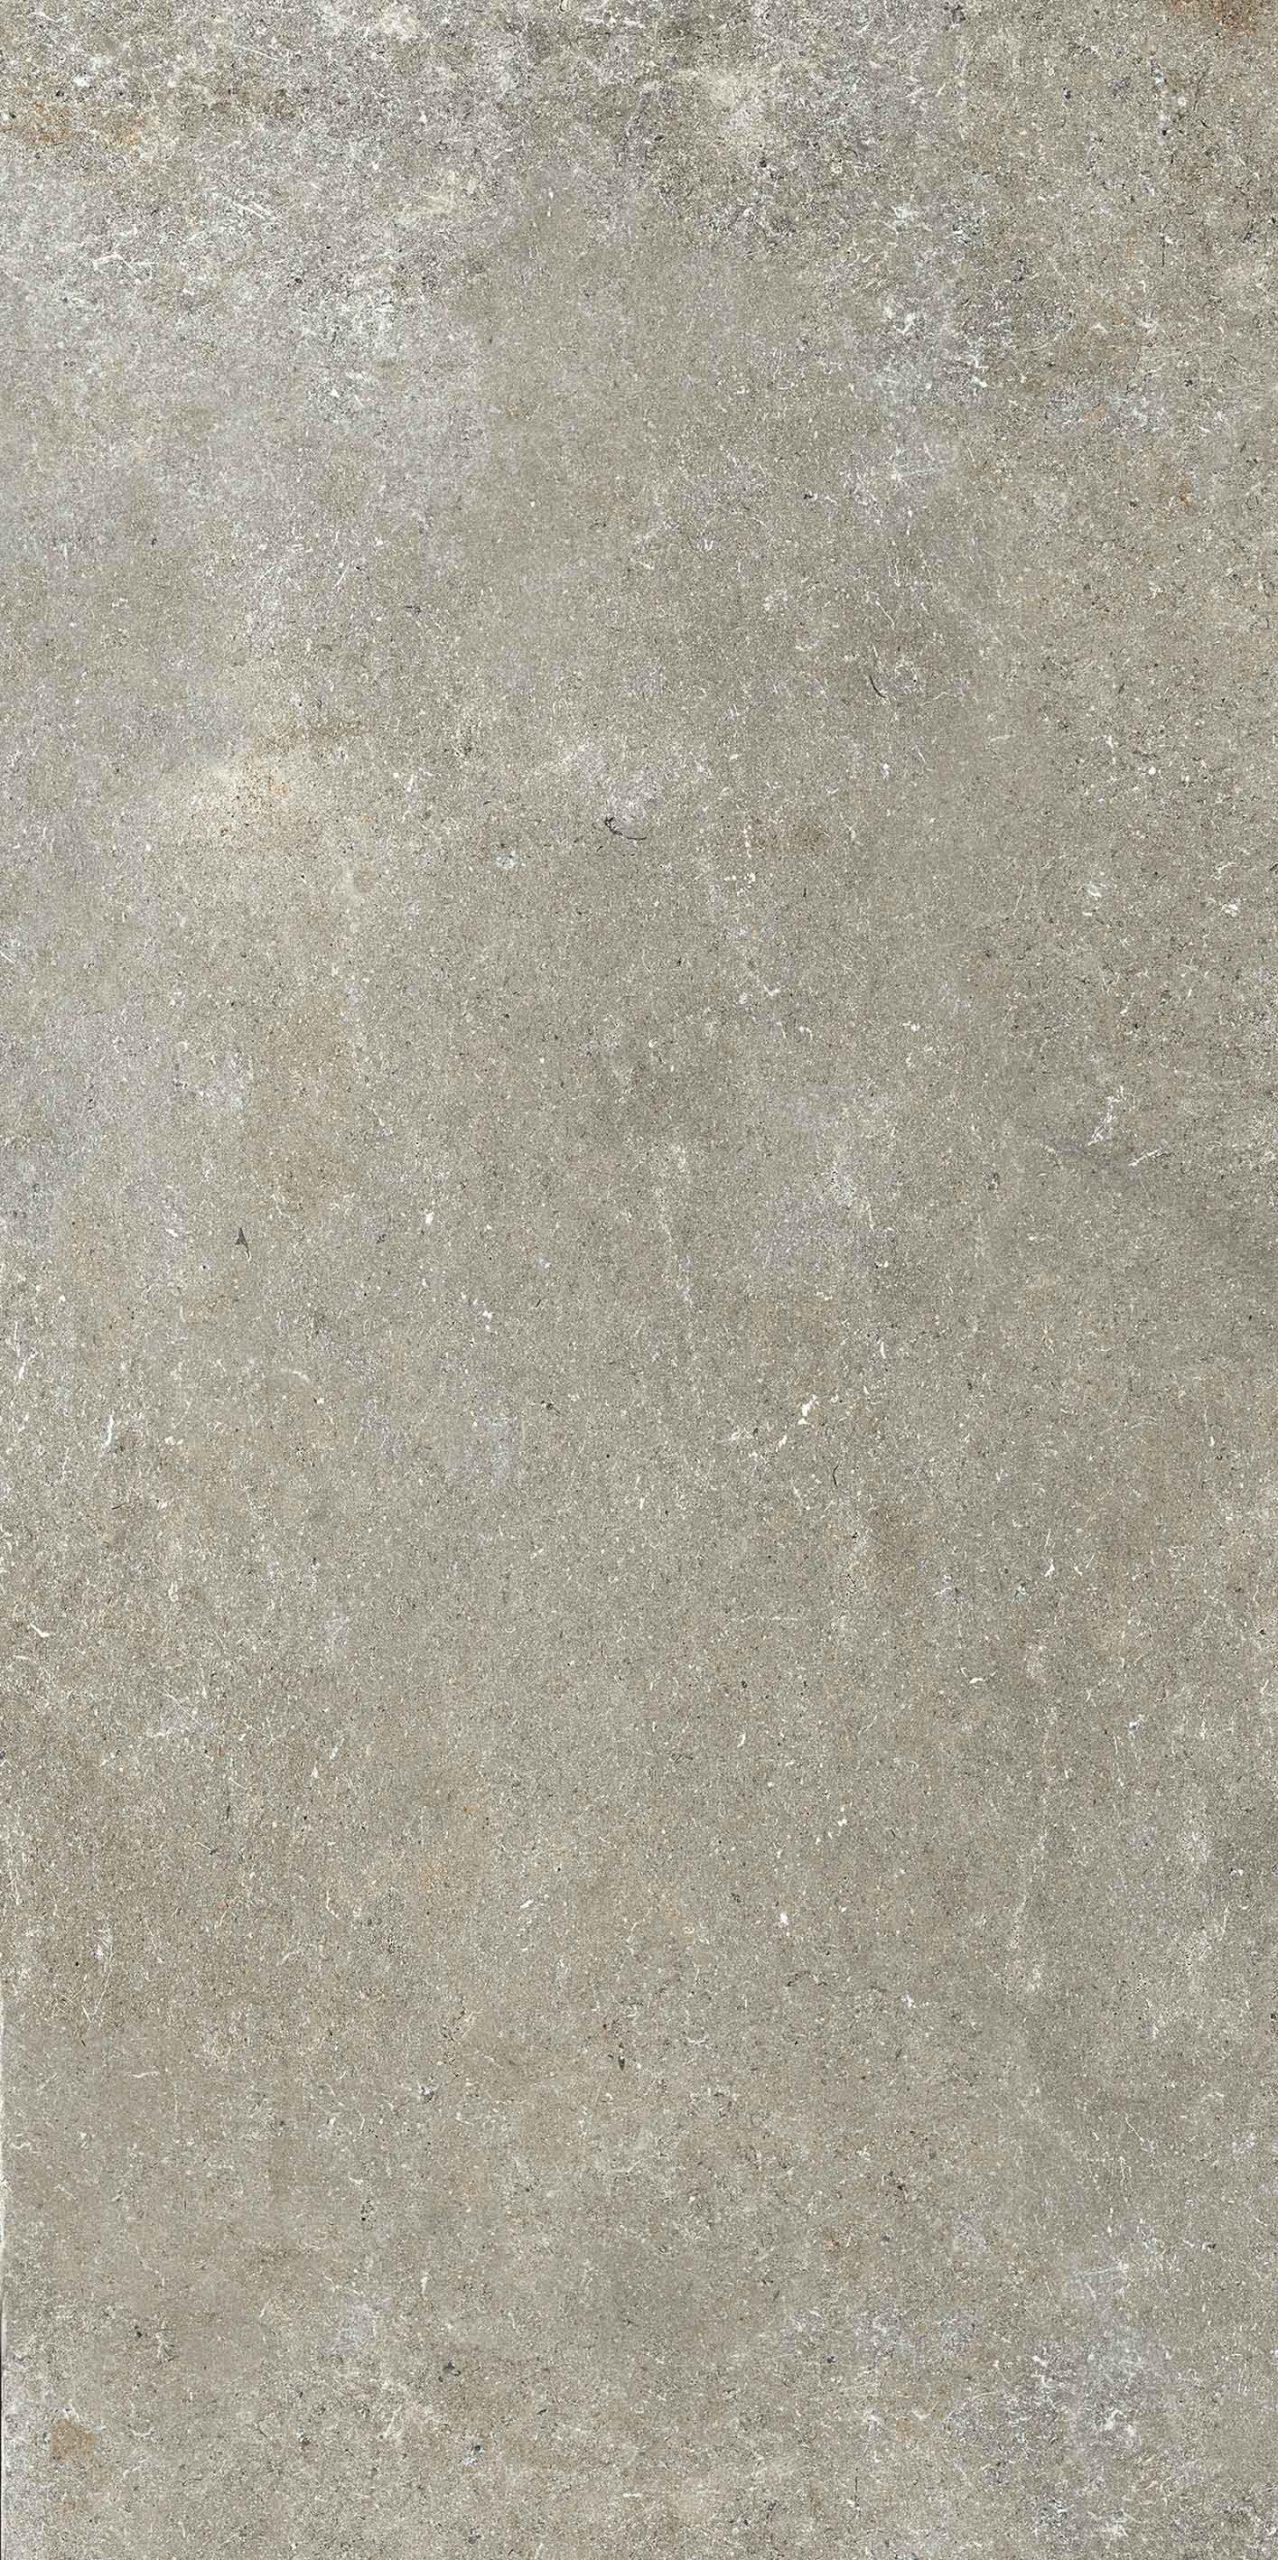 Stontech 4.0 Stone 03 R+PTV 6mm 120 x 240